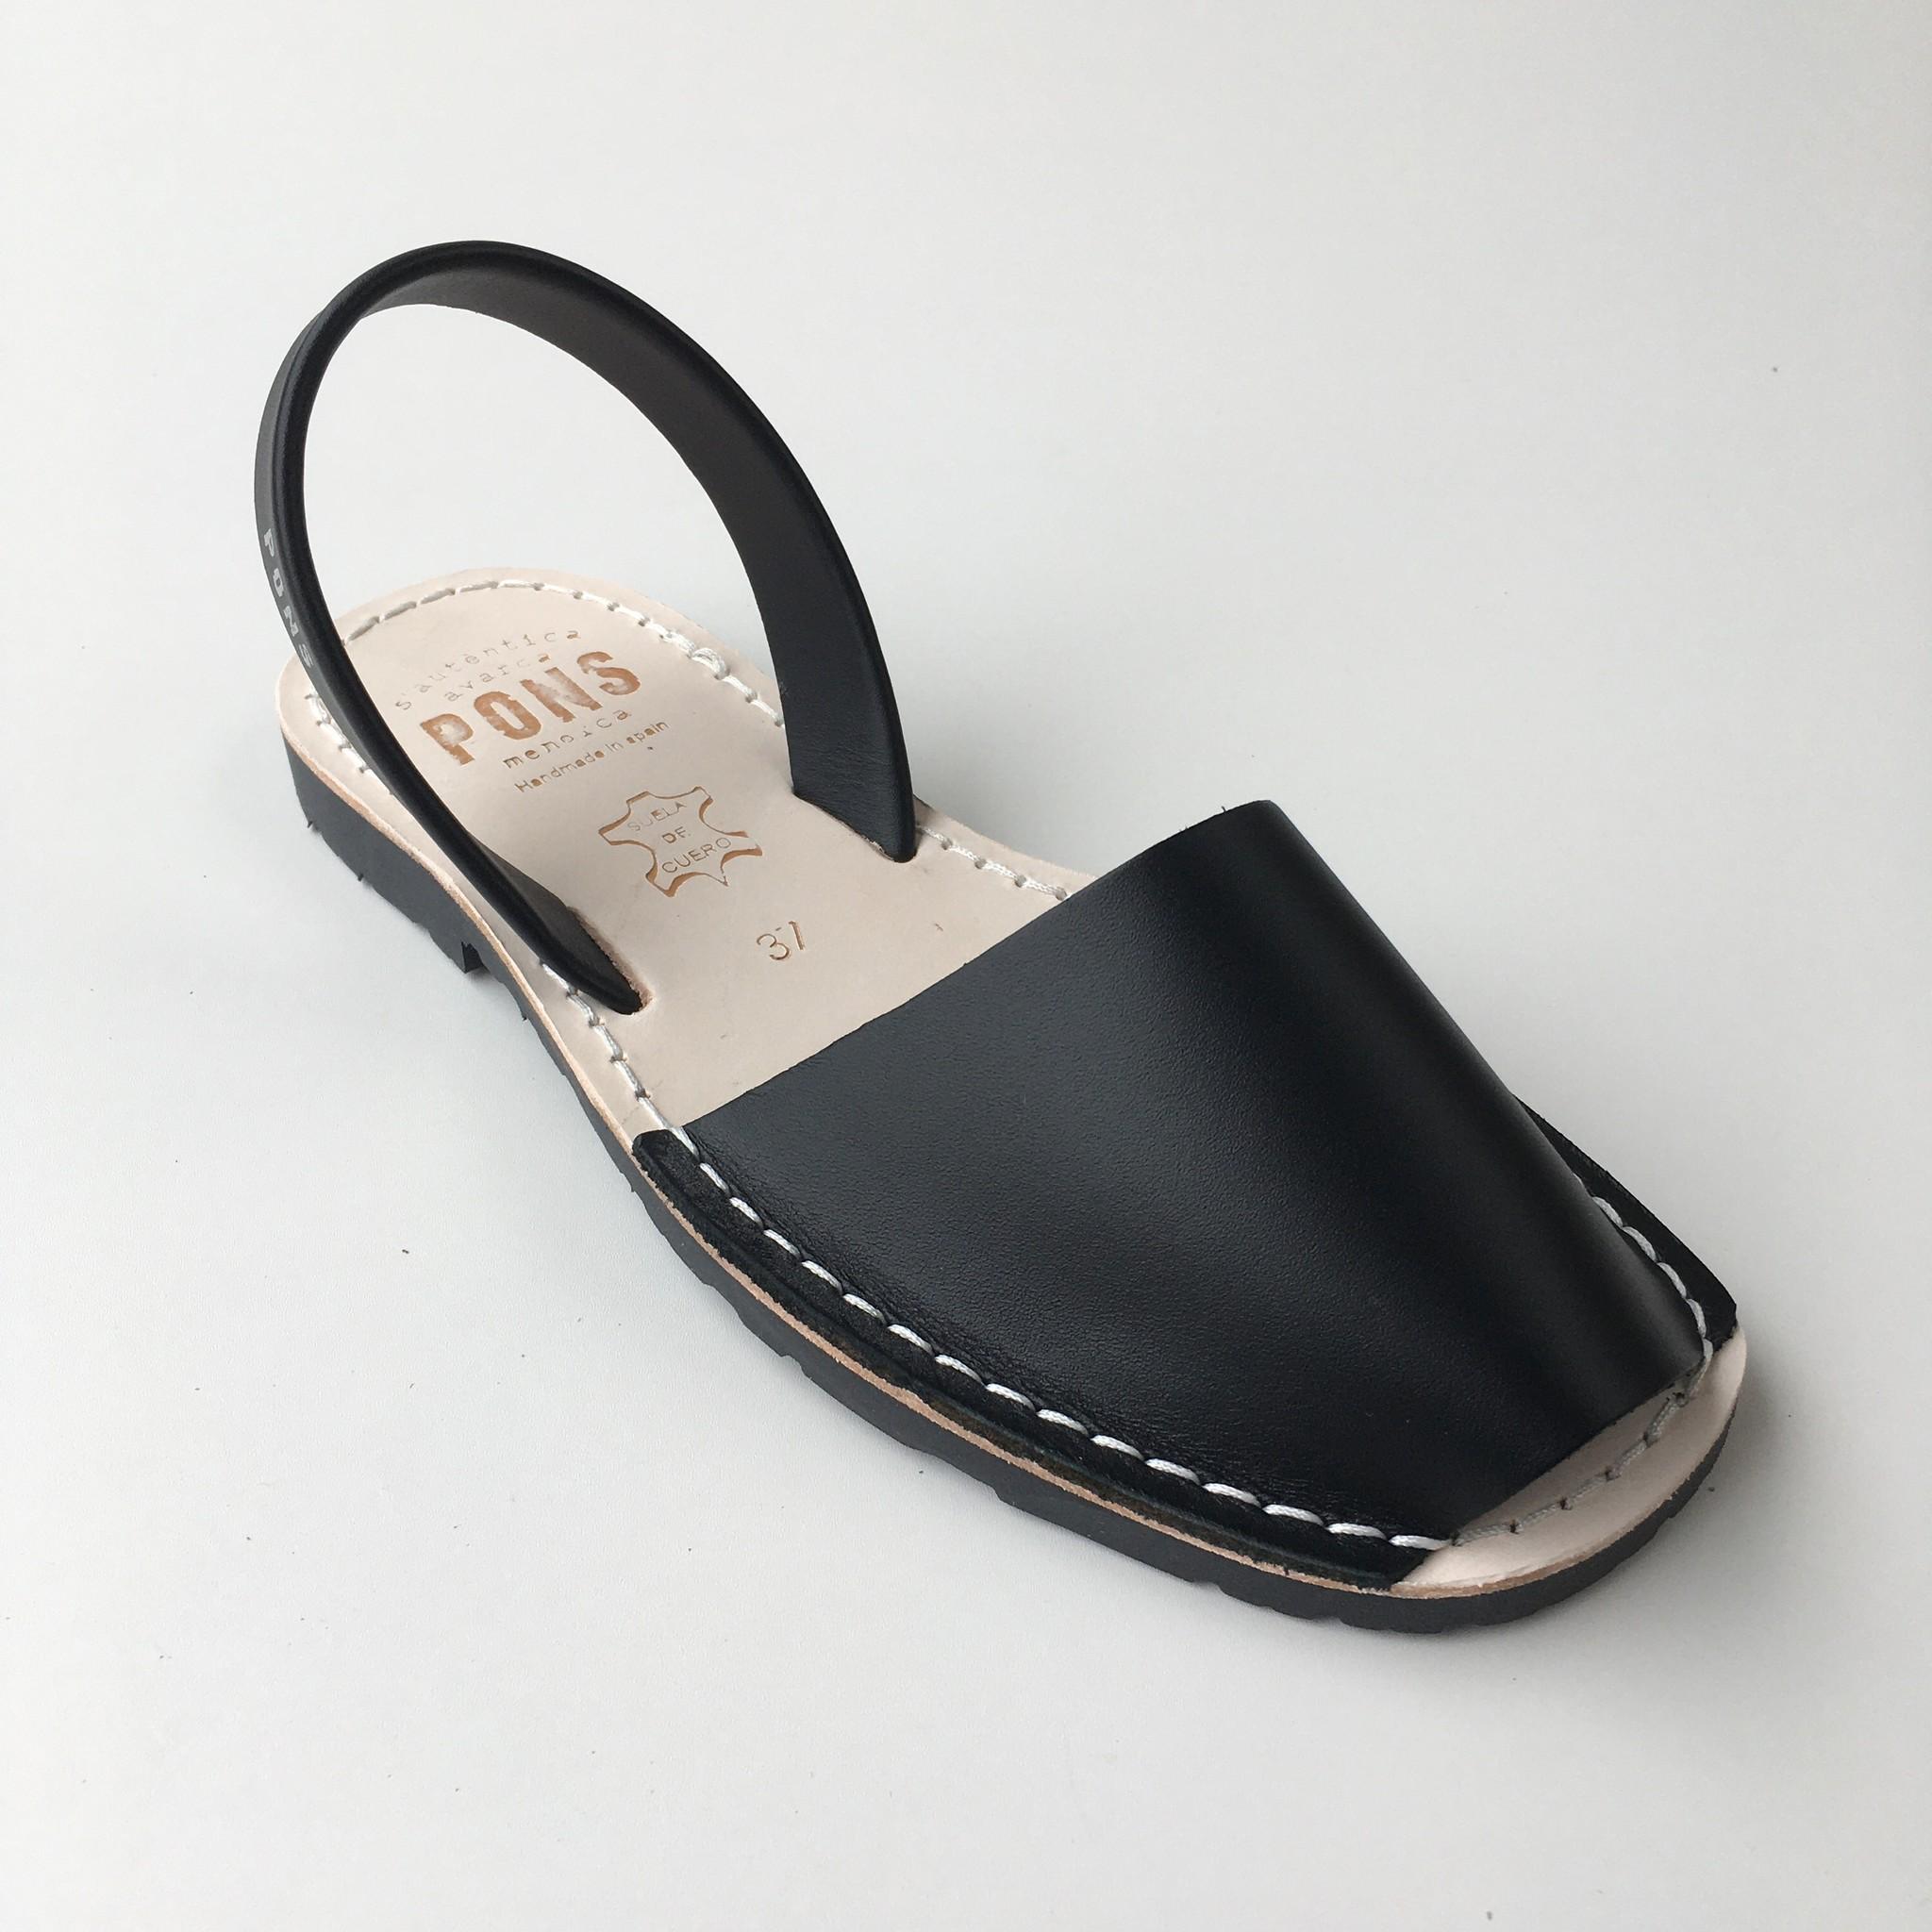 Pons  leren avarca sandaal dames PARIS - zwart - 35 tm 42